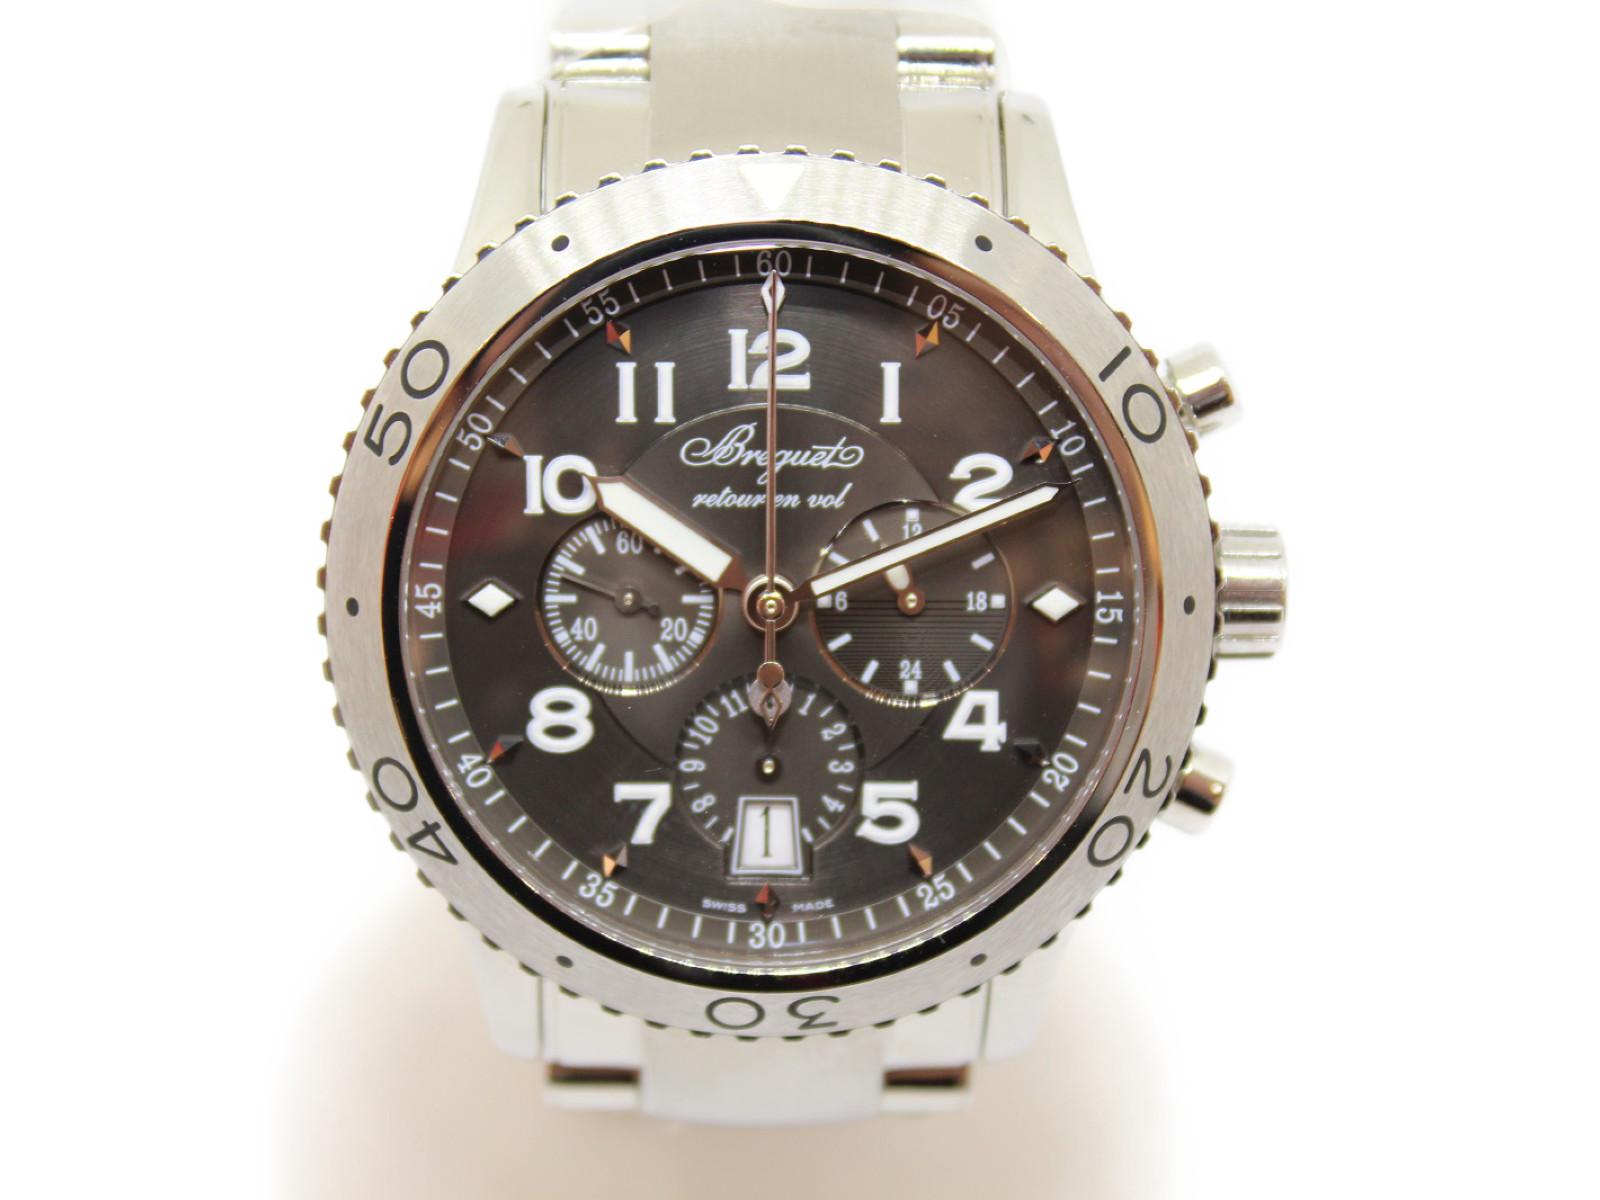 BREGUET ブレゲトランスアトランティック タイプXXI3810ST 月・日付表示クロノグラフ メンズ 腕時計【中古】